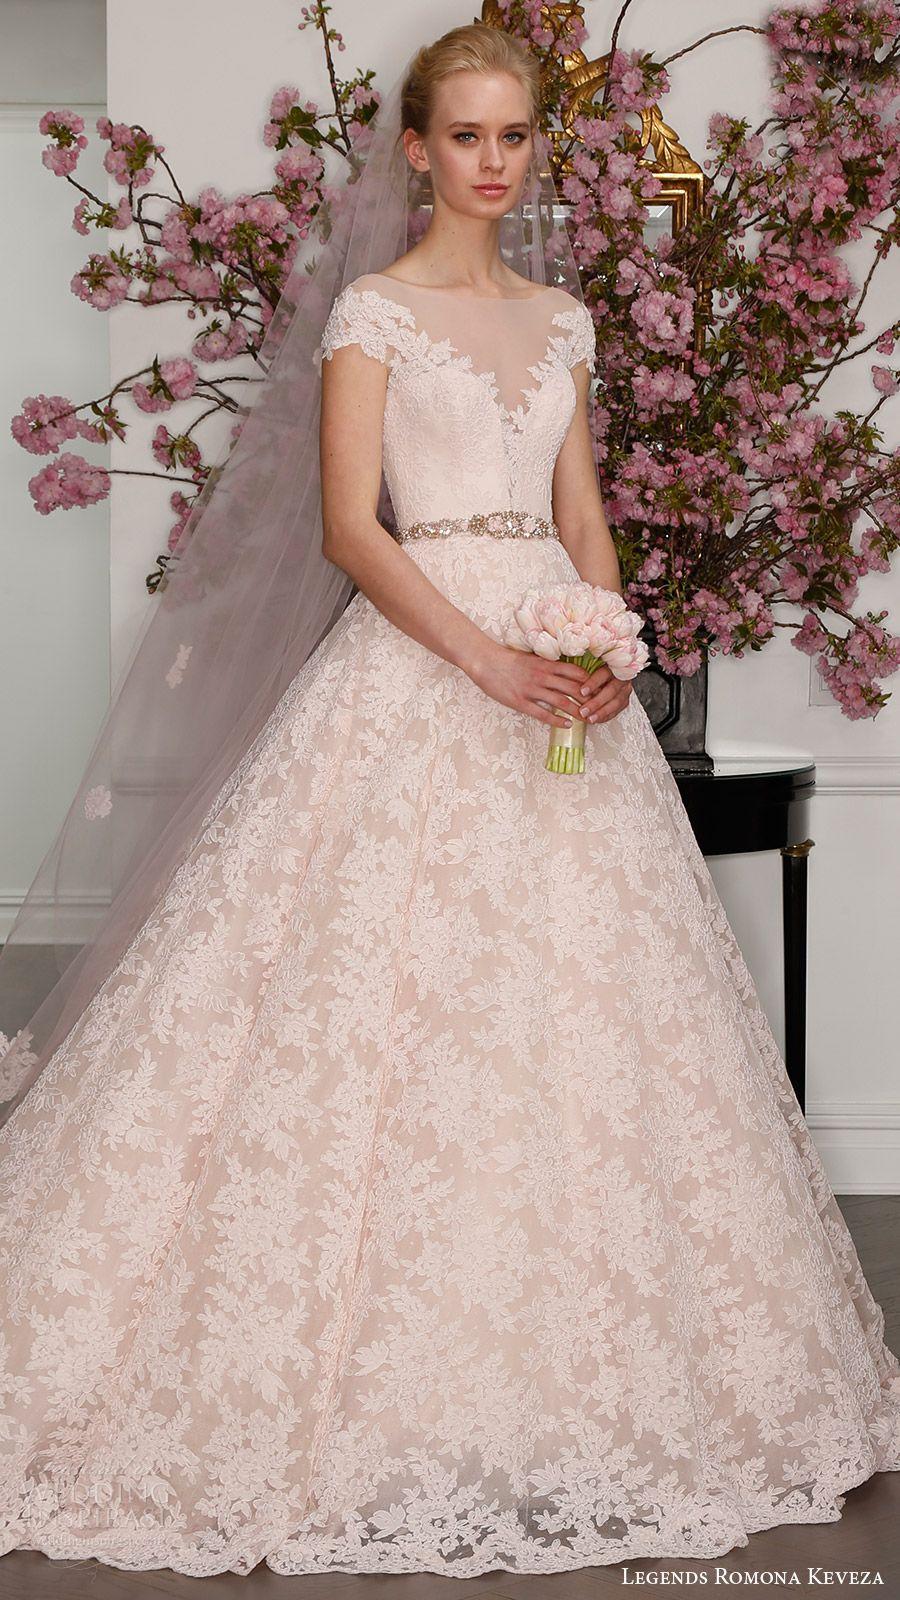 Legends romona keveza spring wedding dresses wedding